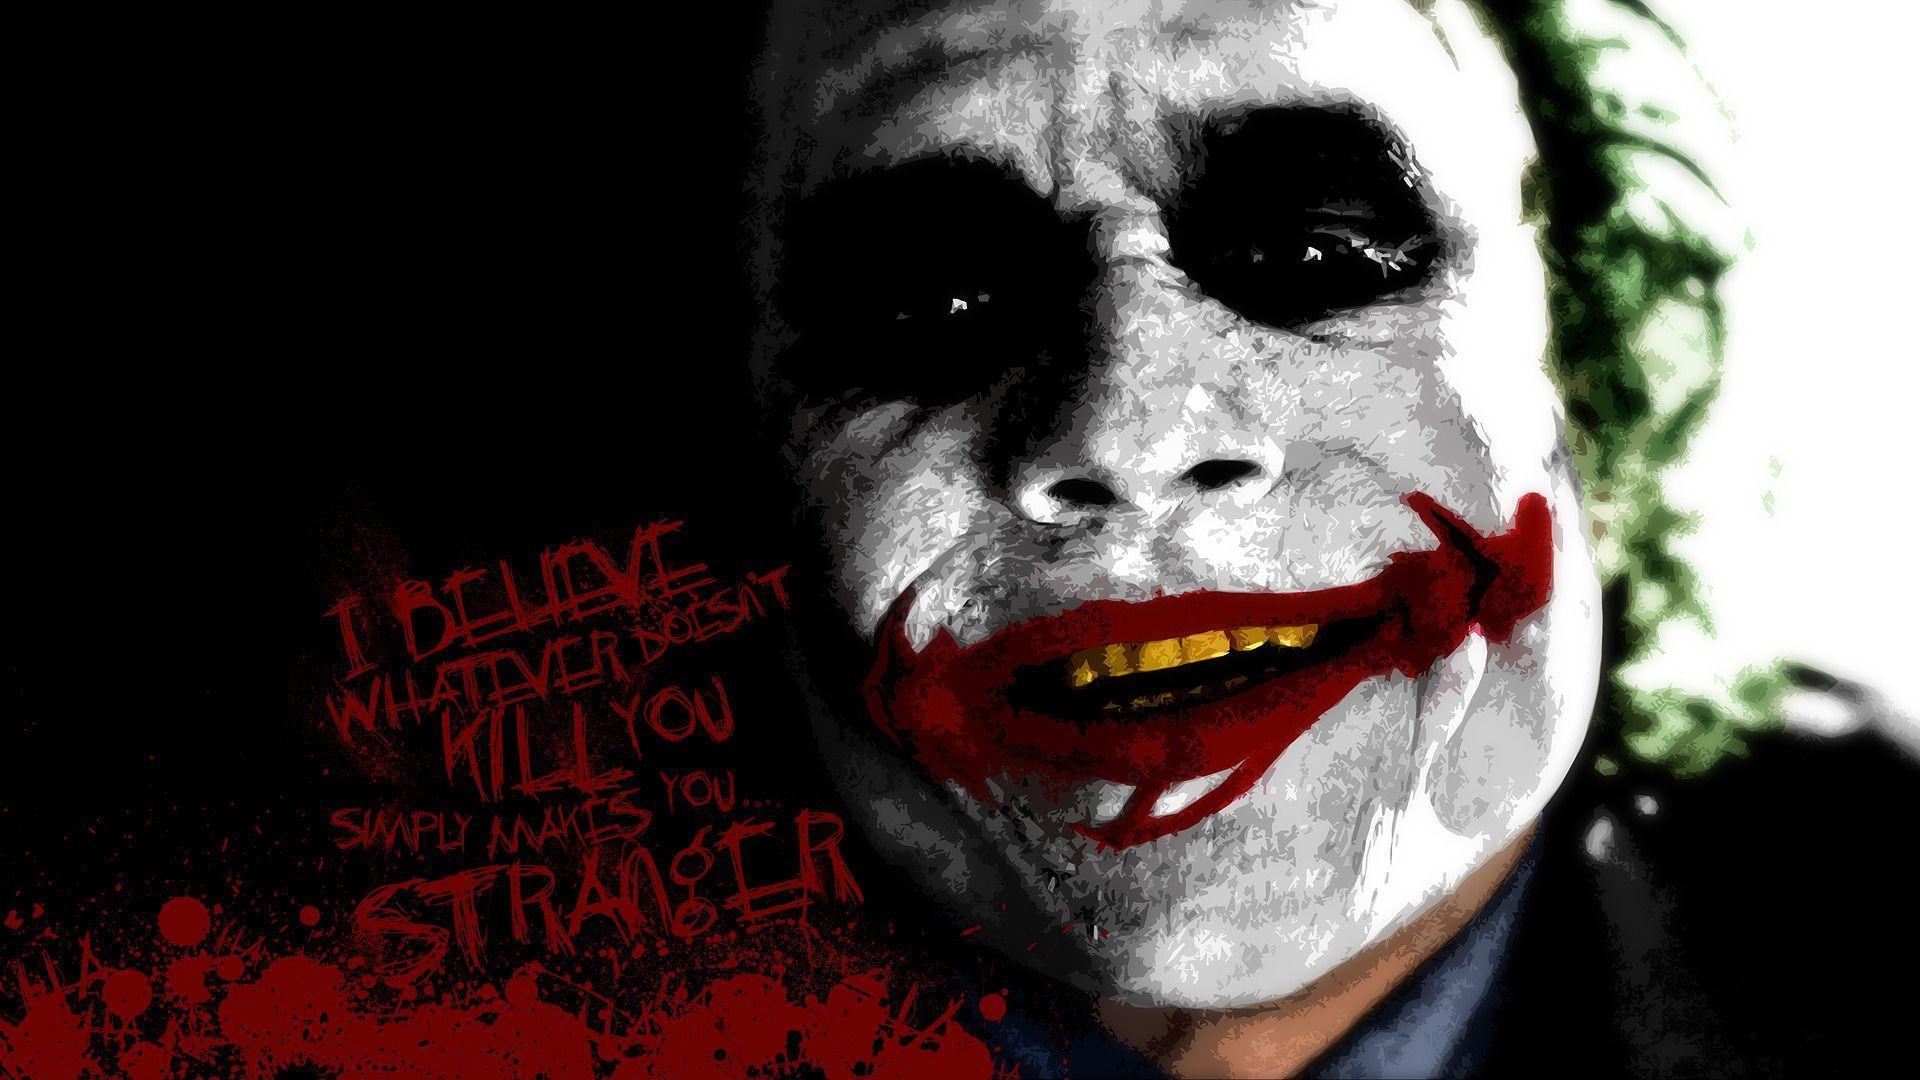 Joker quotes wallpapers wallpaper cave for Joker wallpaper 4k